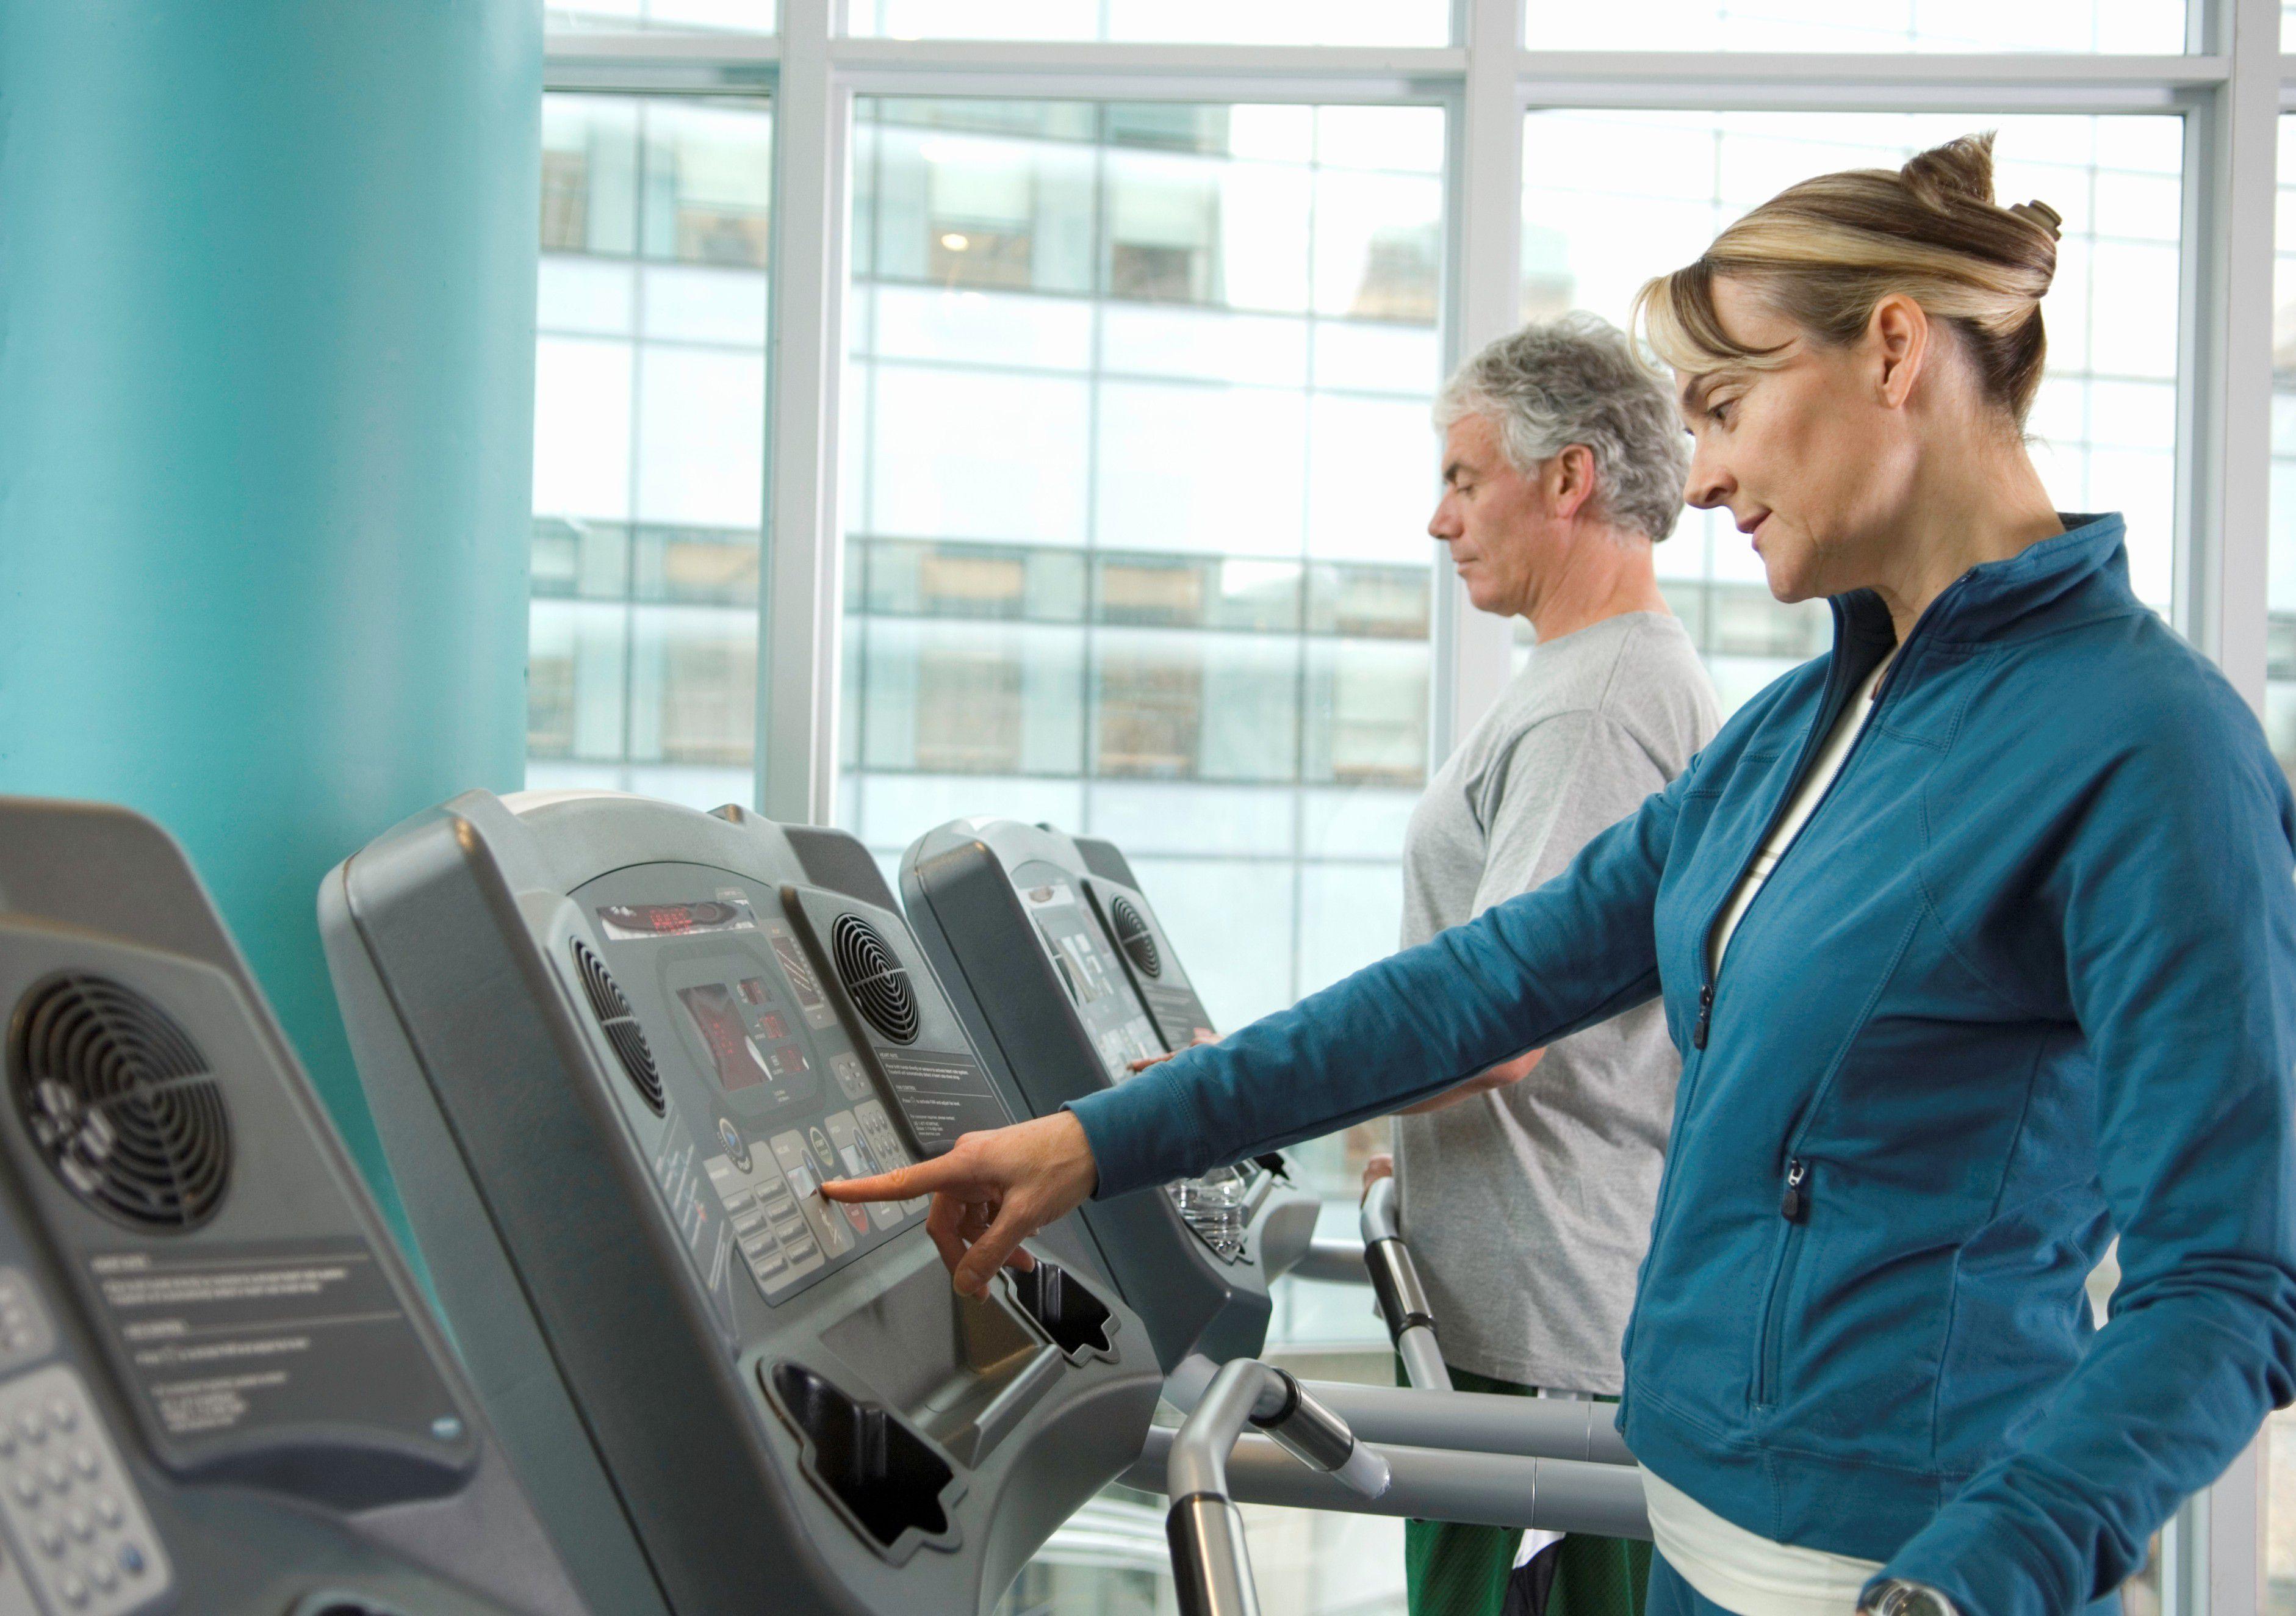 Calorie-Blasting Treadmill Workouts